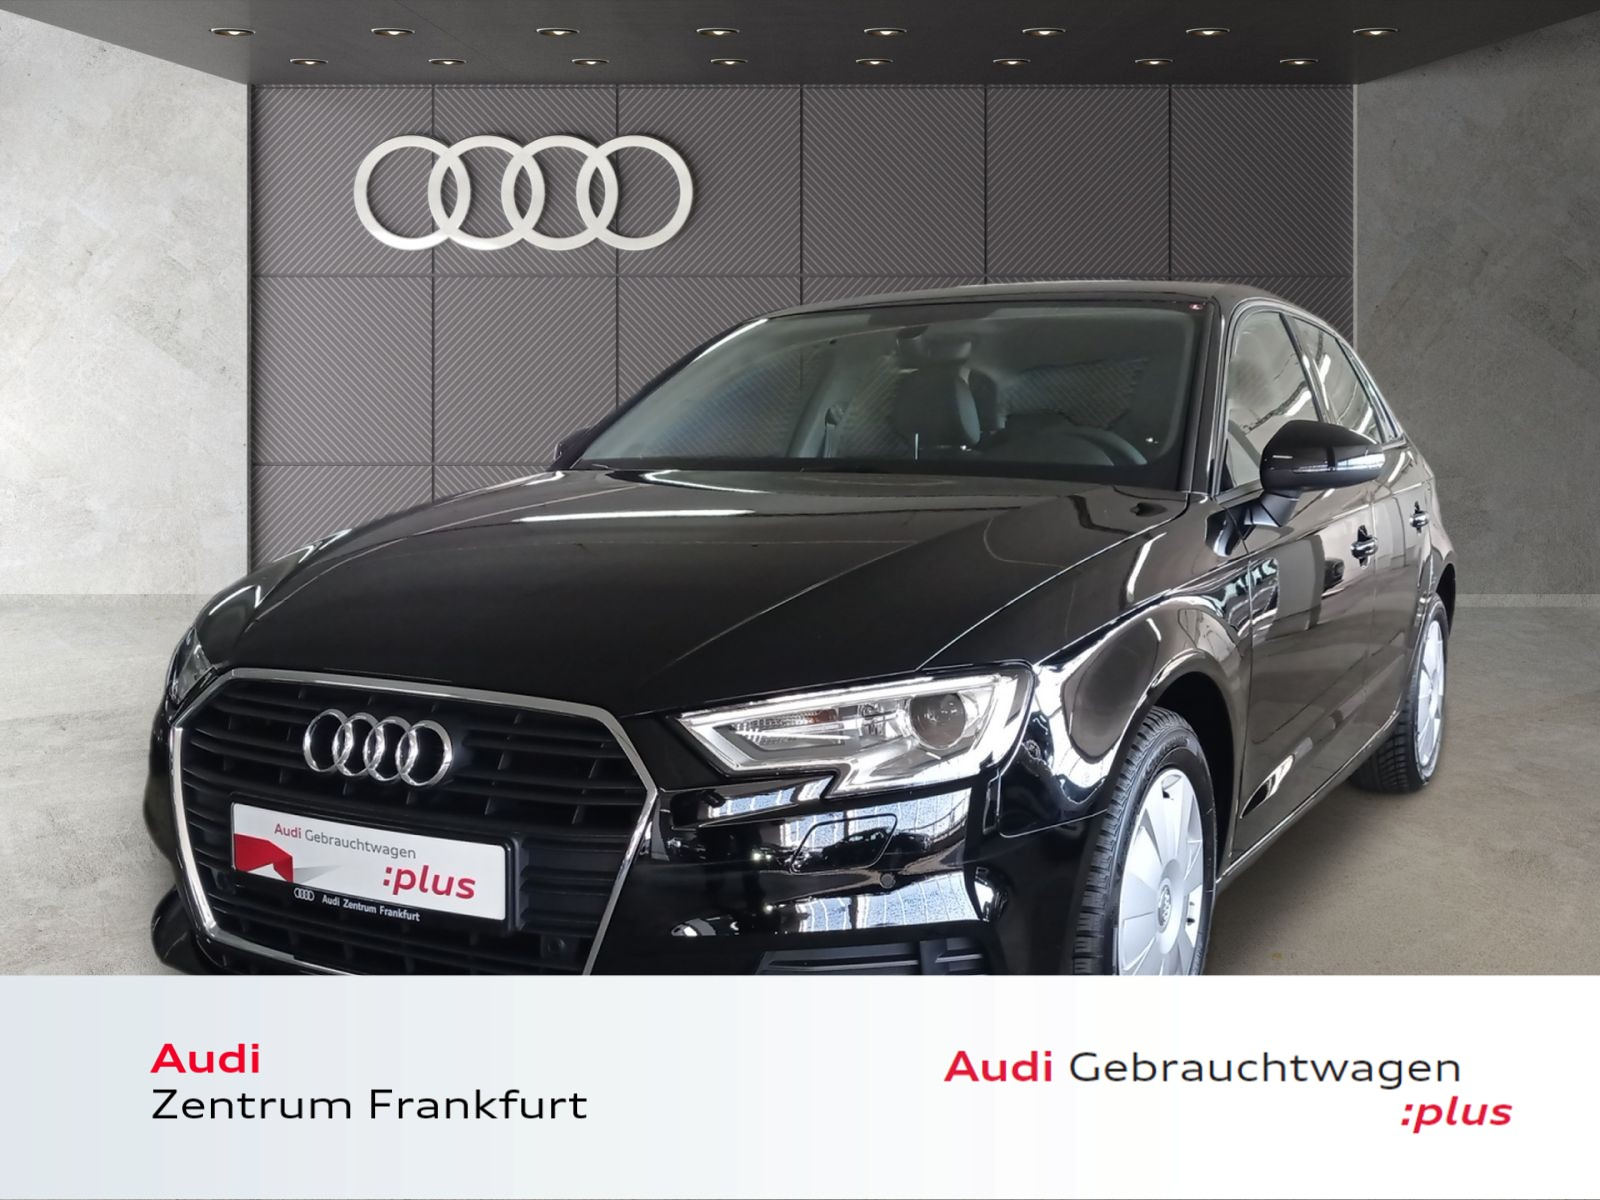 Audi A3 Sportback 30 TFSI Xenon Navi PDC Sitzheizung Bluetooth, Jahr 2019, Benzin